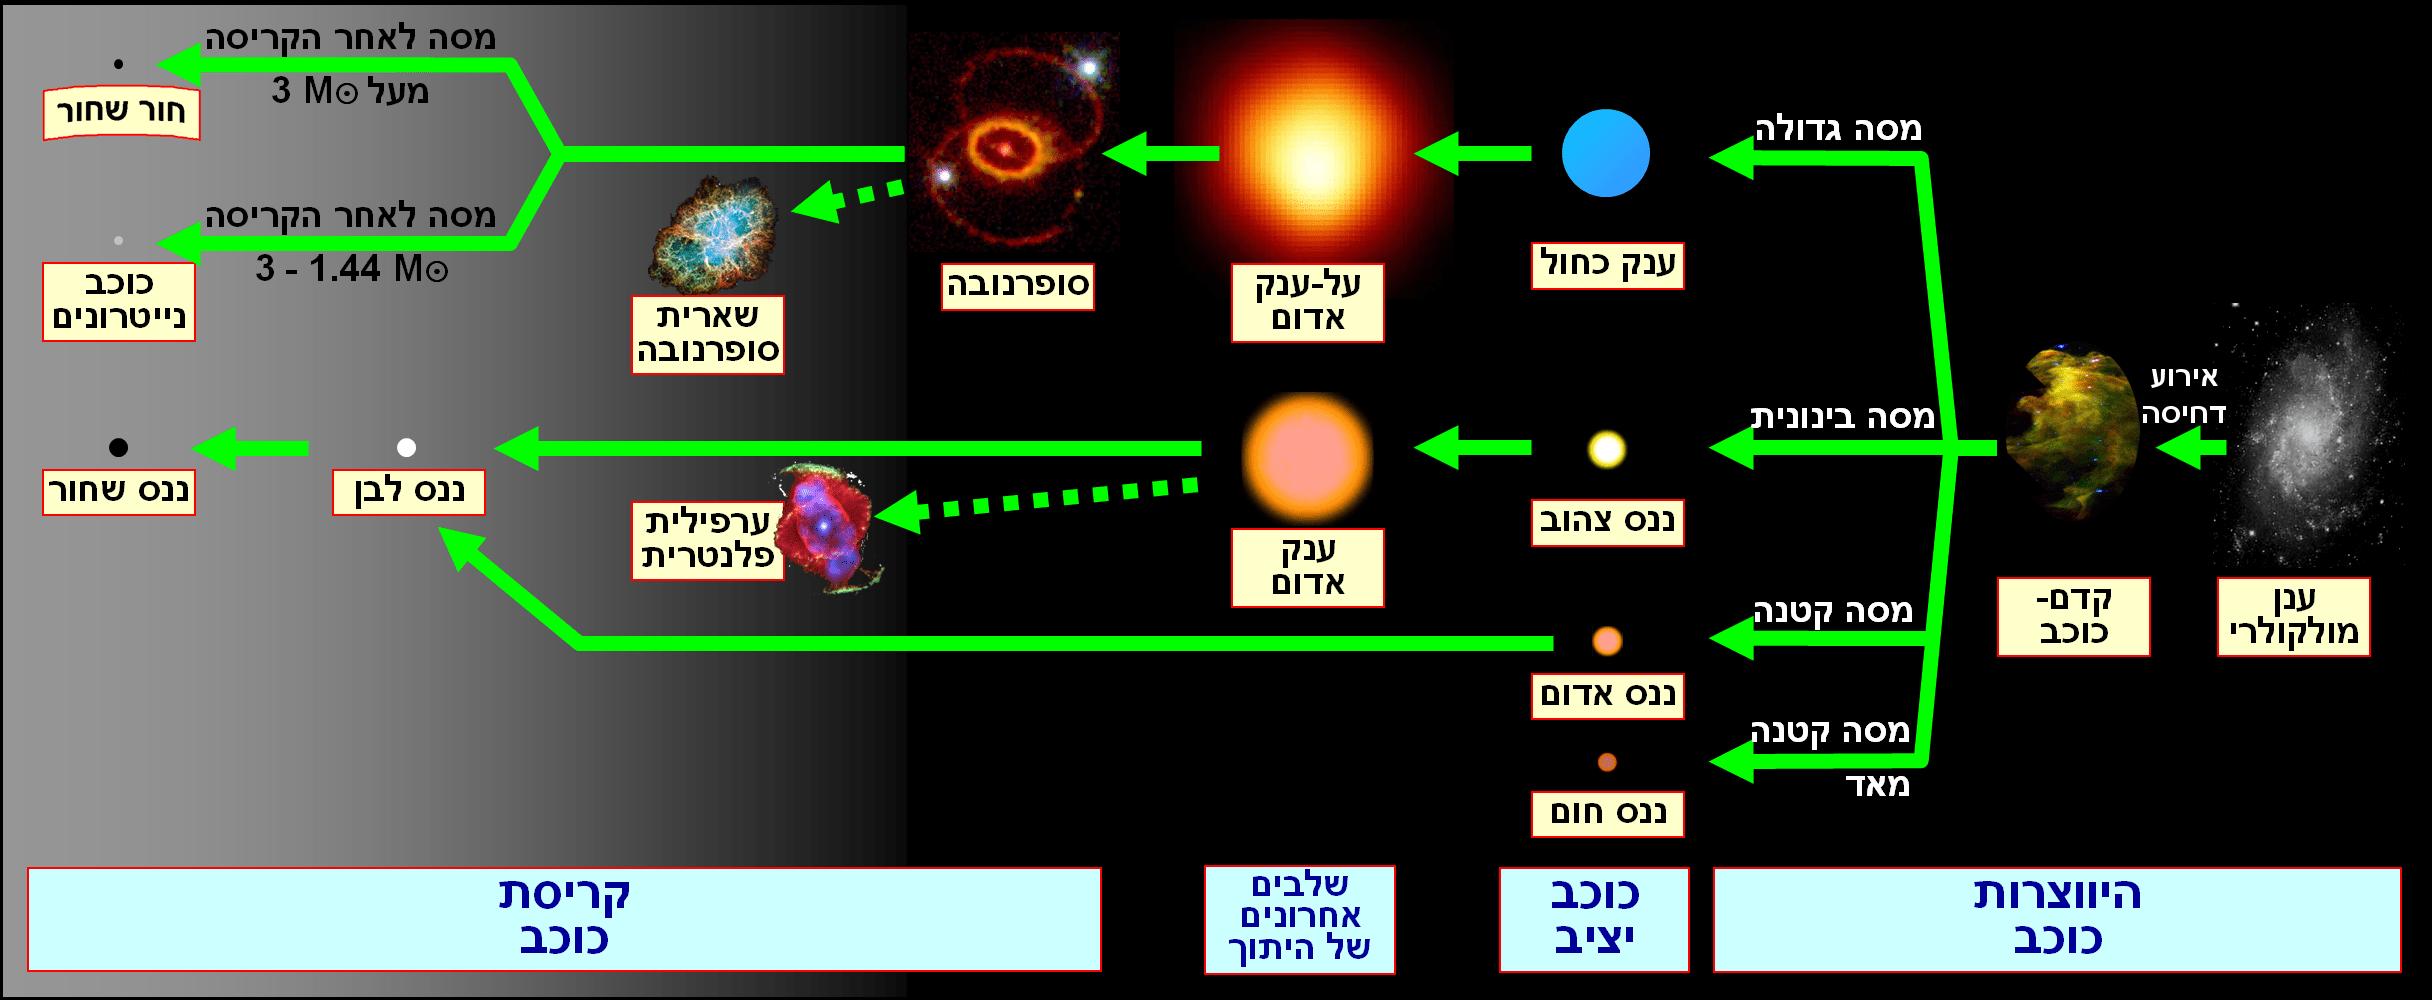 hertzsprung russell diagram activity 1992 honda prelude headlight wiring interactive hr image edited from https upload wikimedia org wikipedia commons 0 0f stellar evolution hebrew png